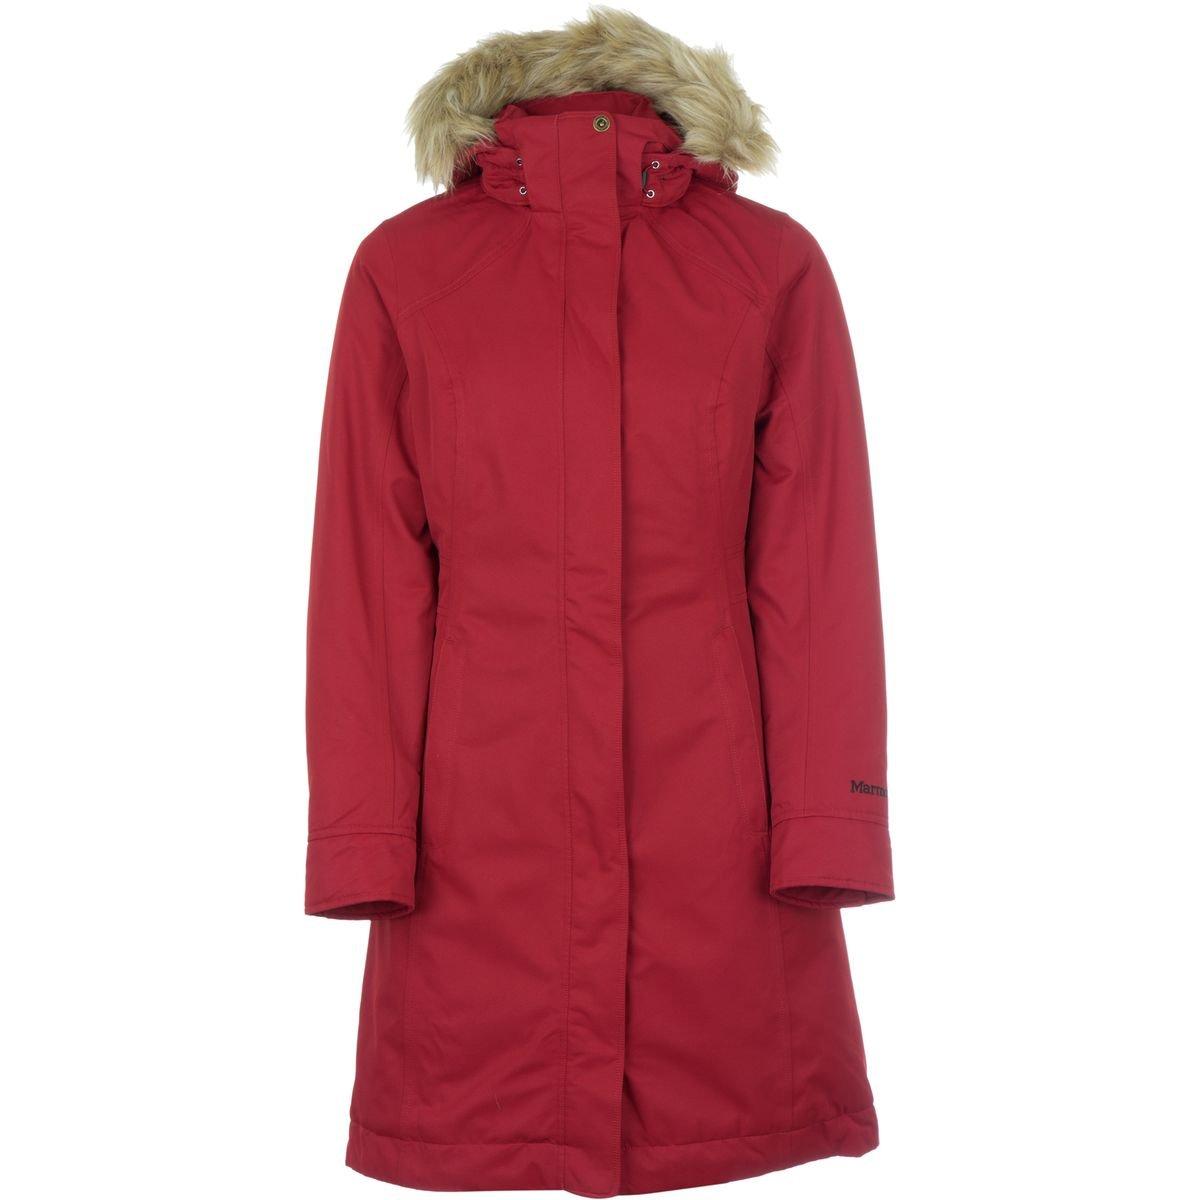 Marmot Damen Chelsea Coat online kaufen